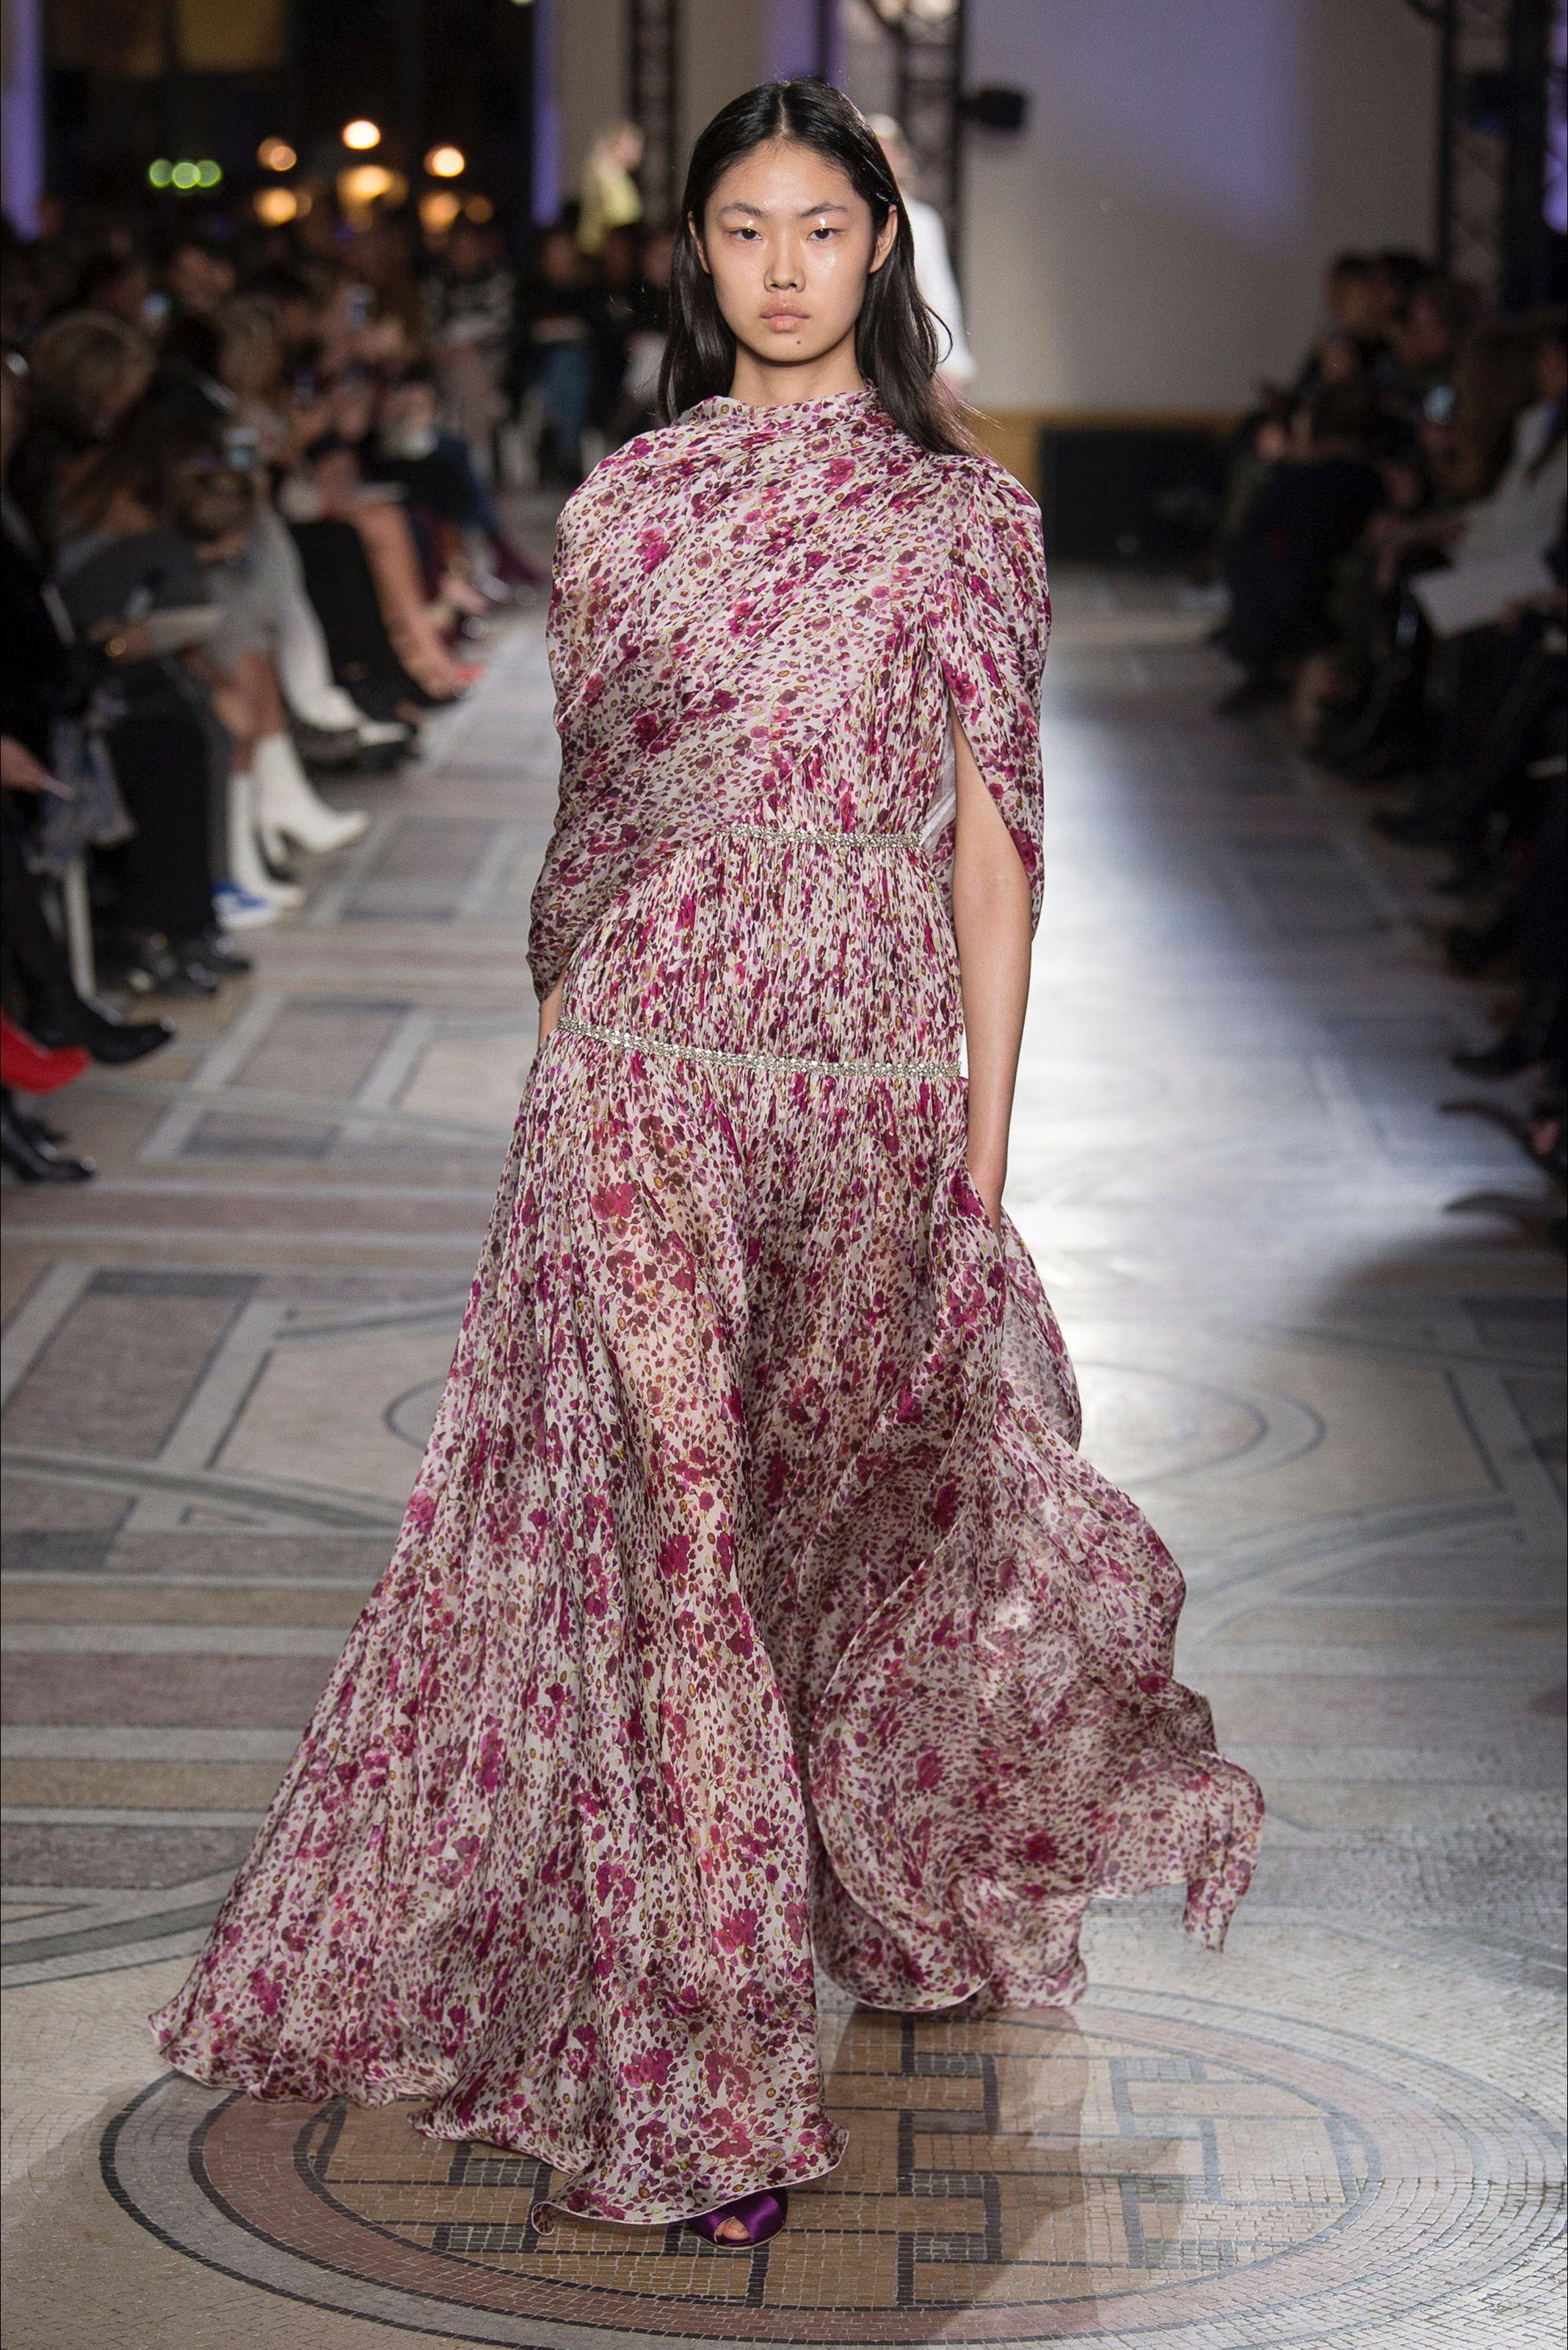 65e2952e03 Sfilata Giambattista Valli Parigi - Alta Moda Primavera Estate 2018 - Vogue